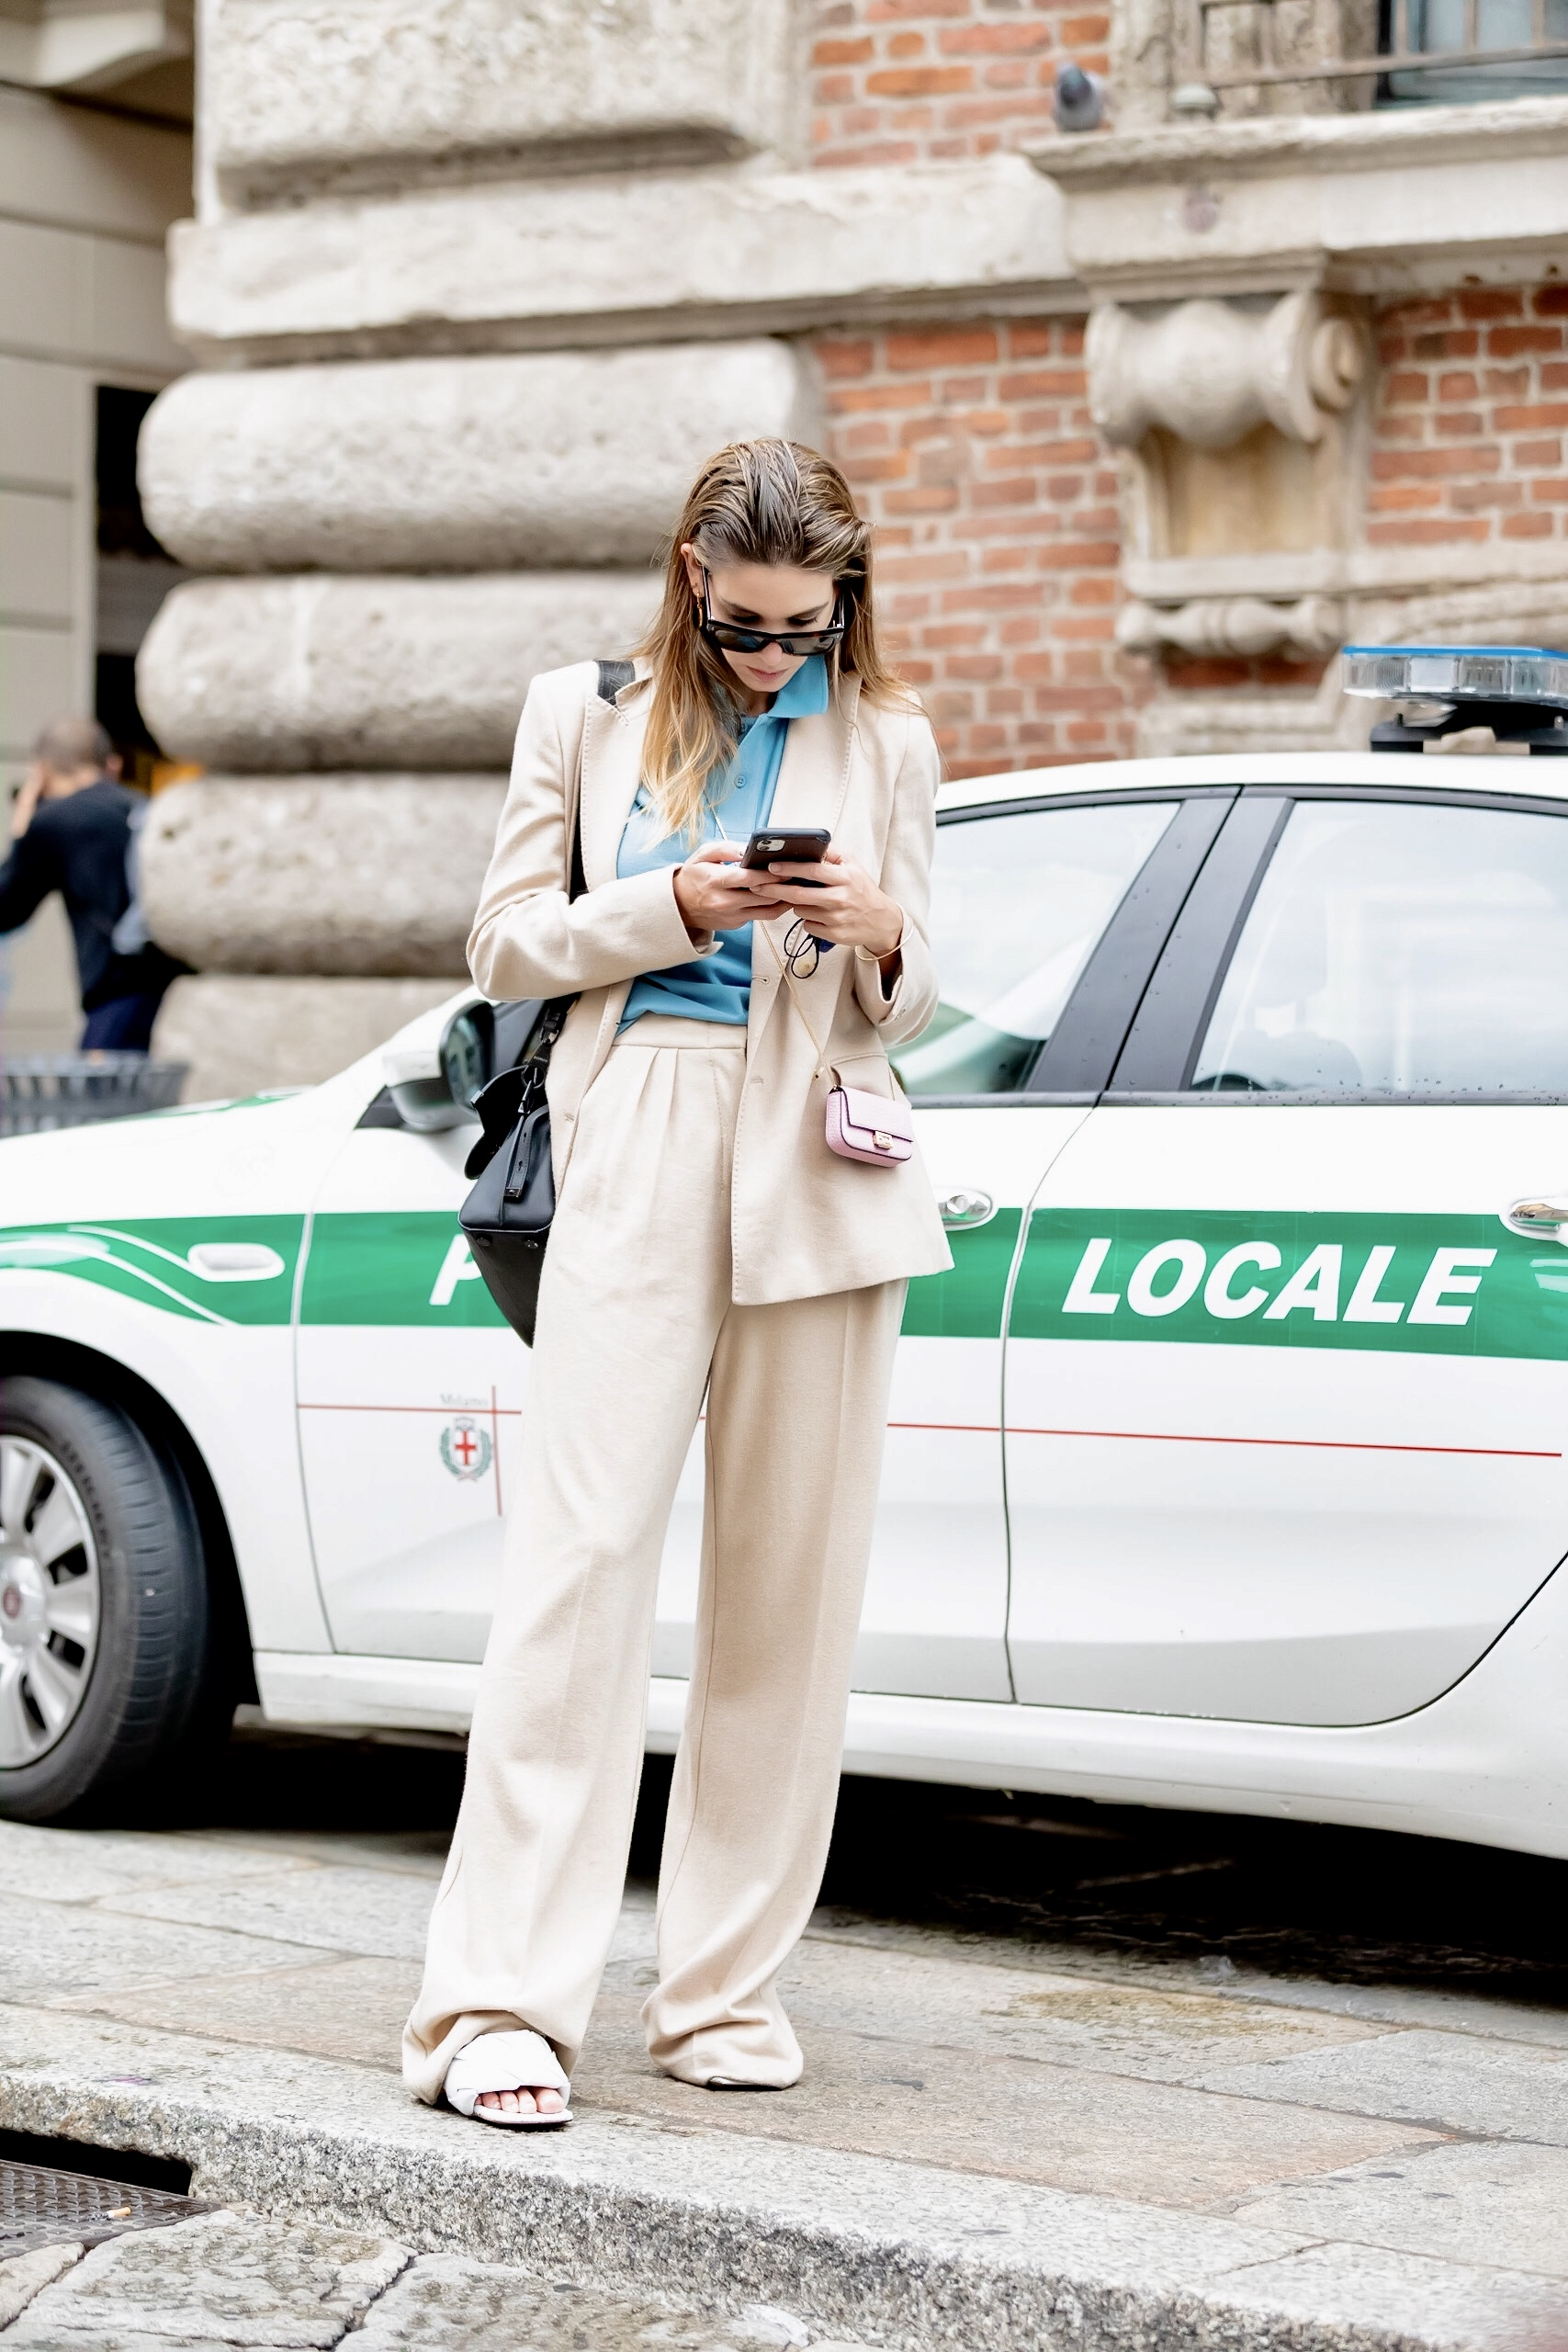 Milan Spring 2021 Day 2 Street Style by Nick Leuze Photos